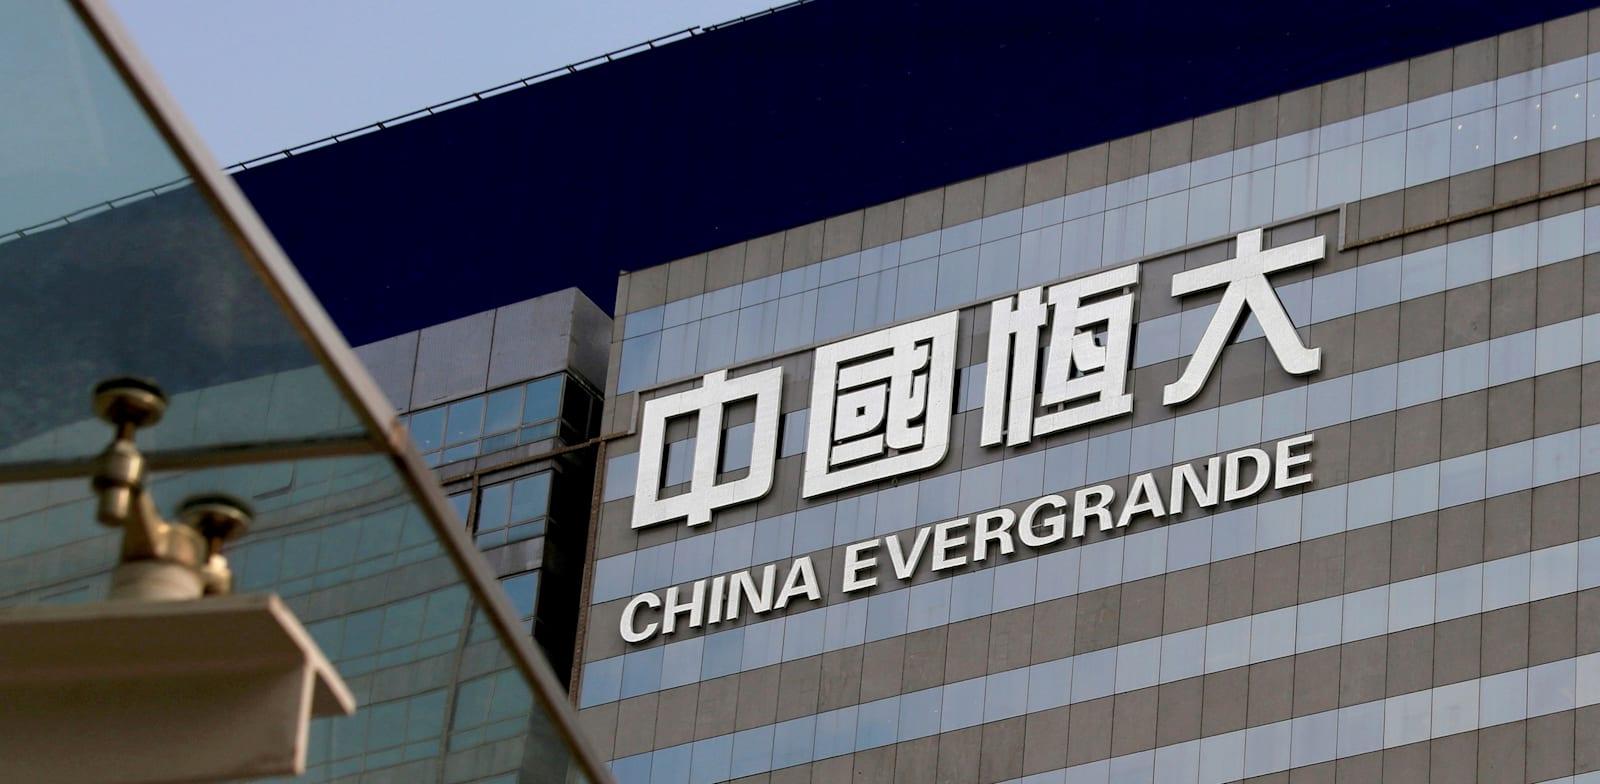 ענקית הנדל''ן הסינית אוורגרנד / צילום: Reuters